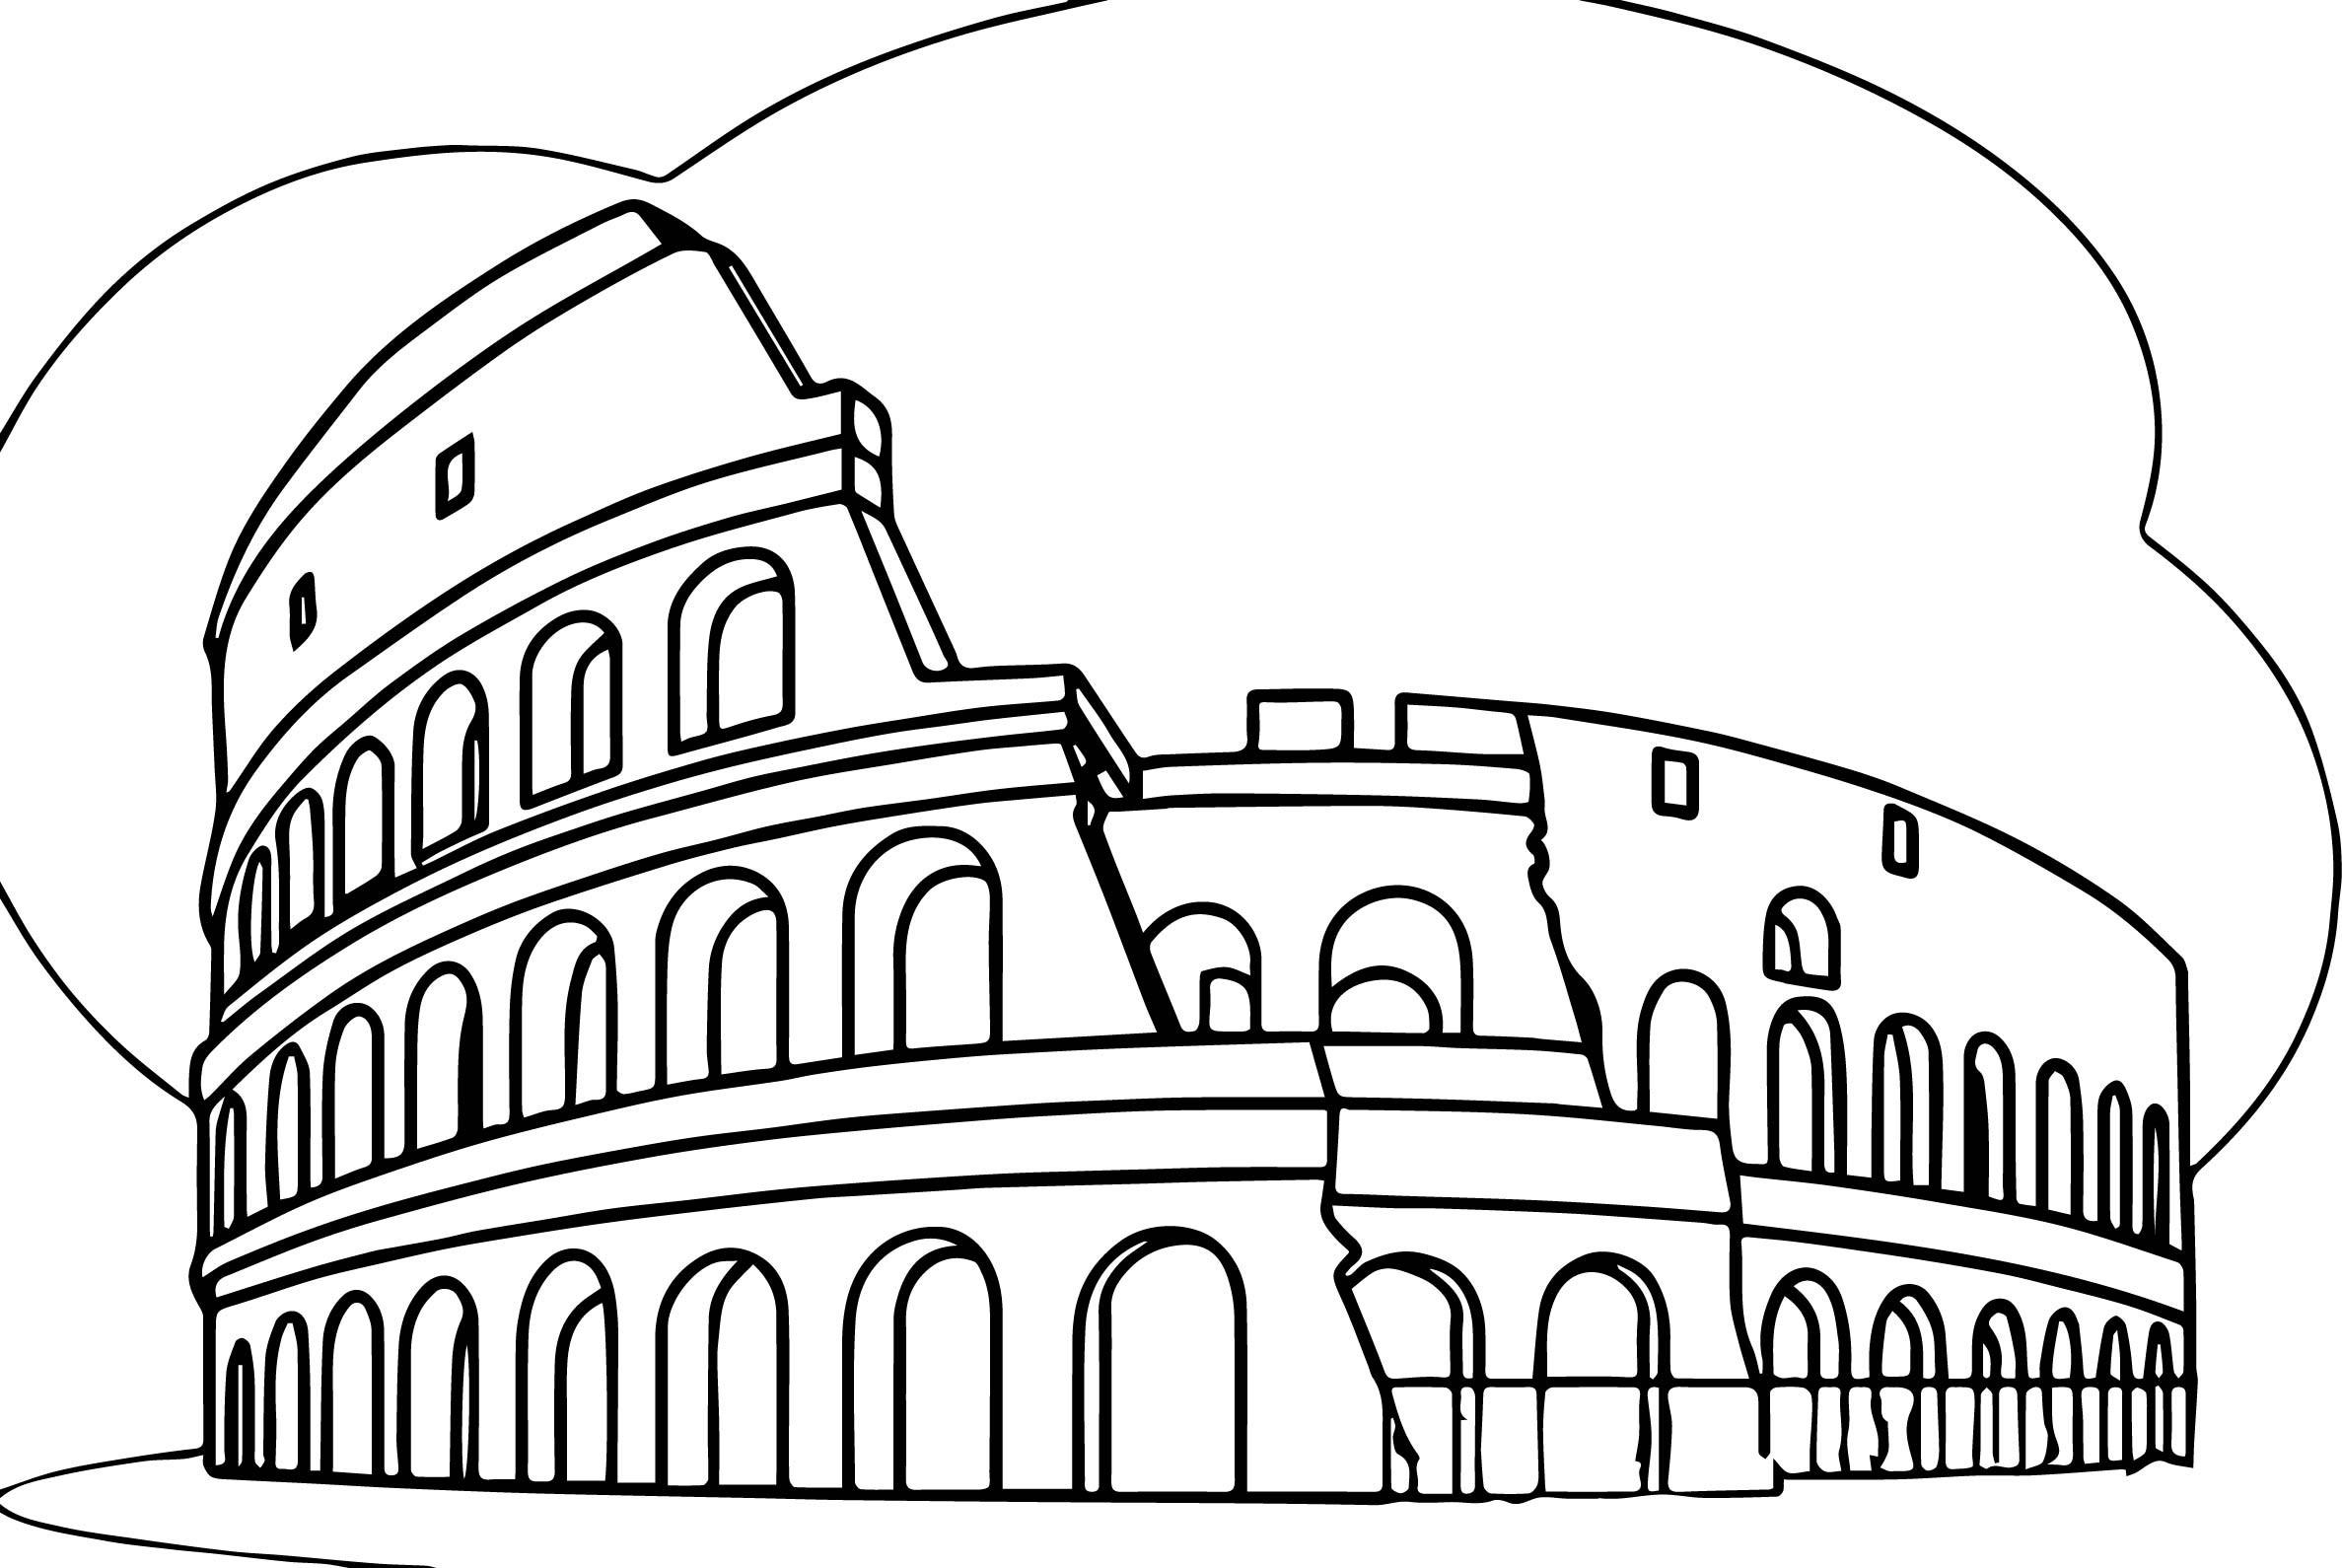 Gondola Coloring Page At Getcolorings